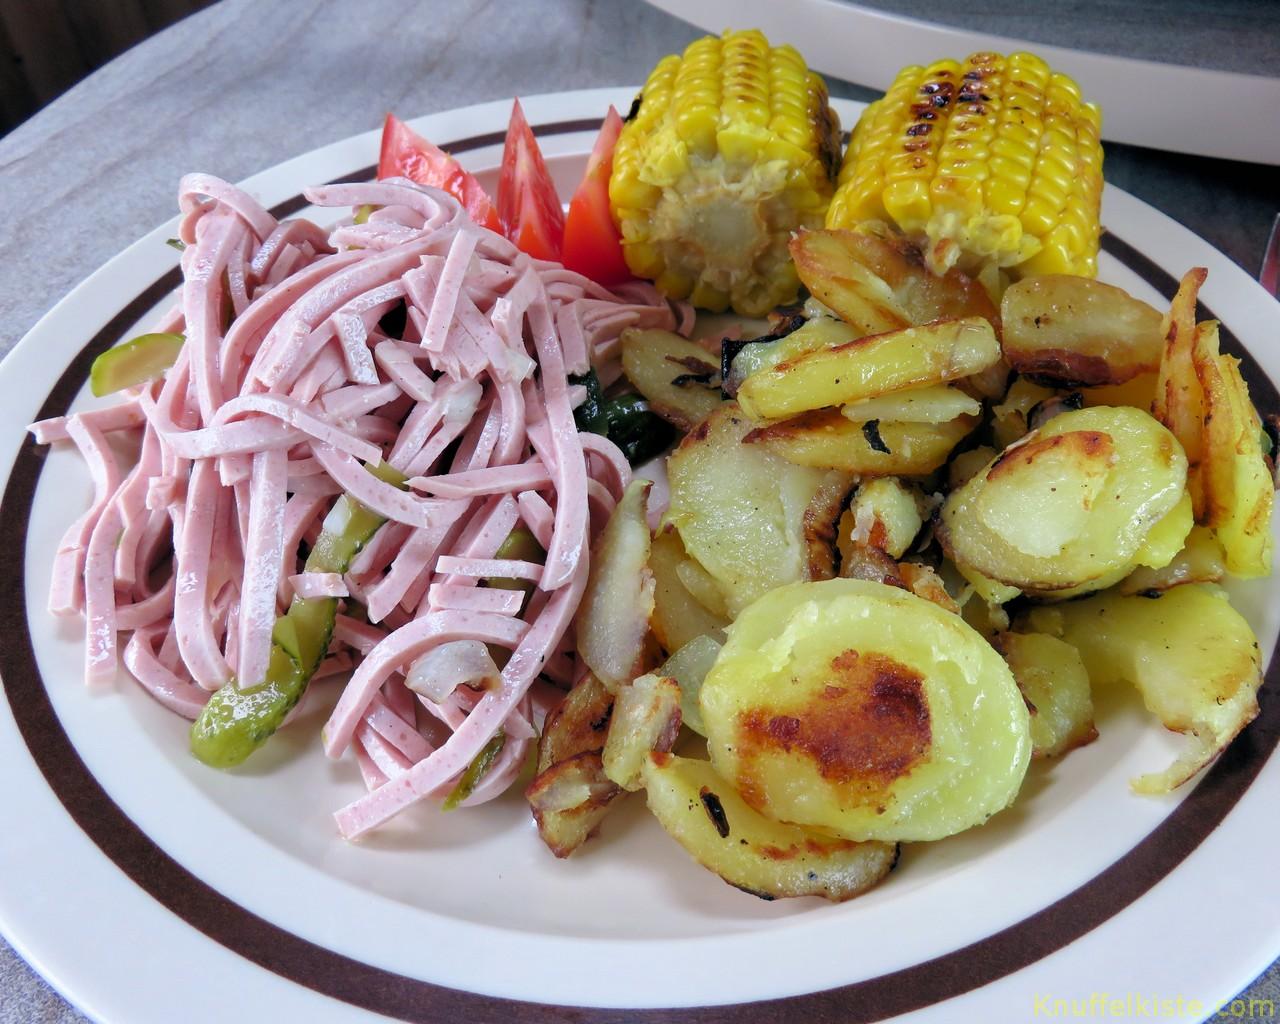 Bratkartoffel und Wurstsalat